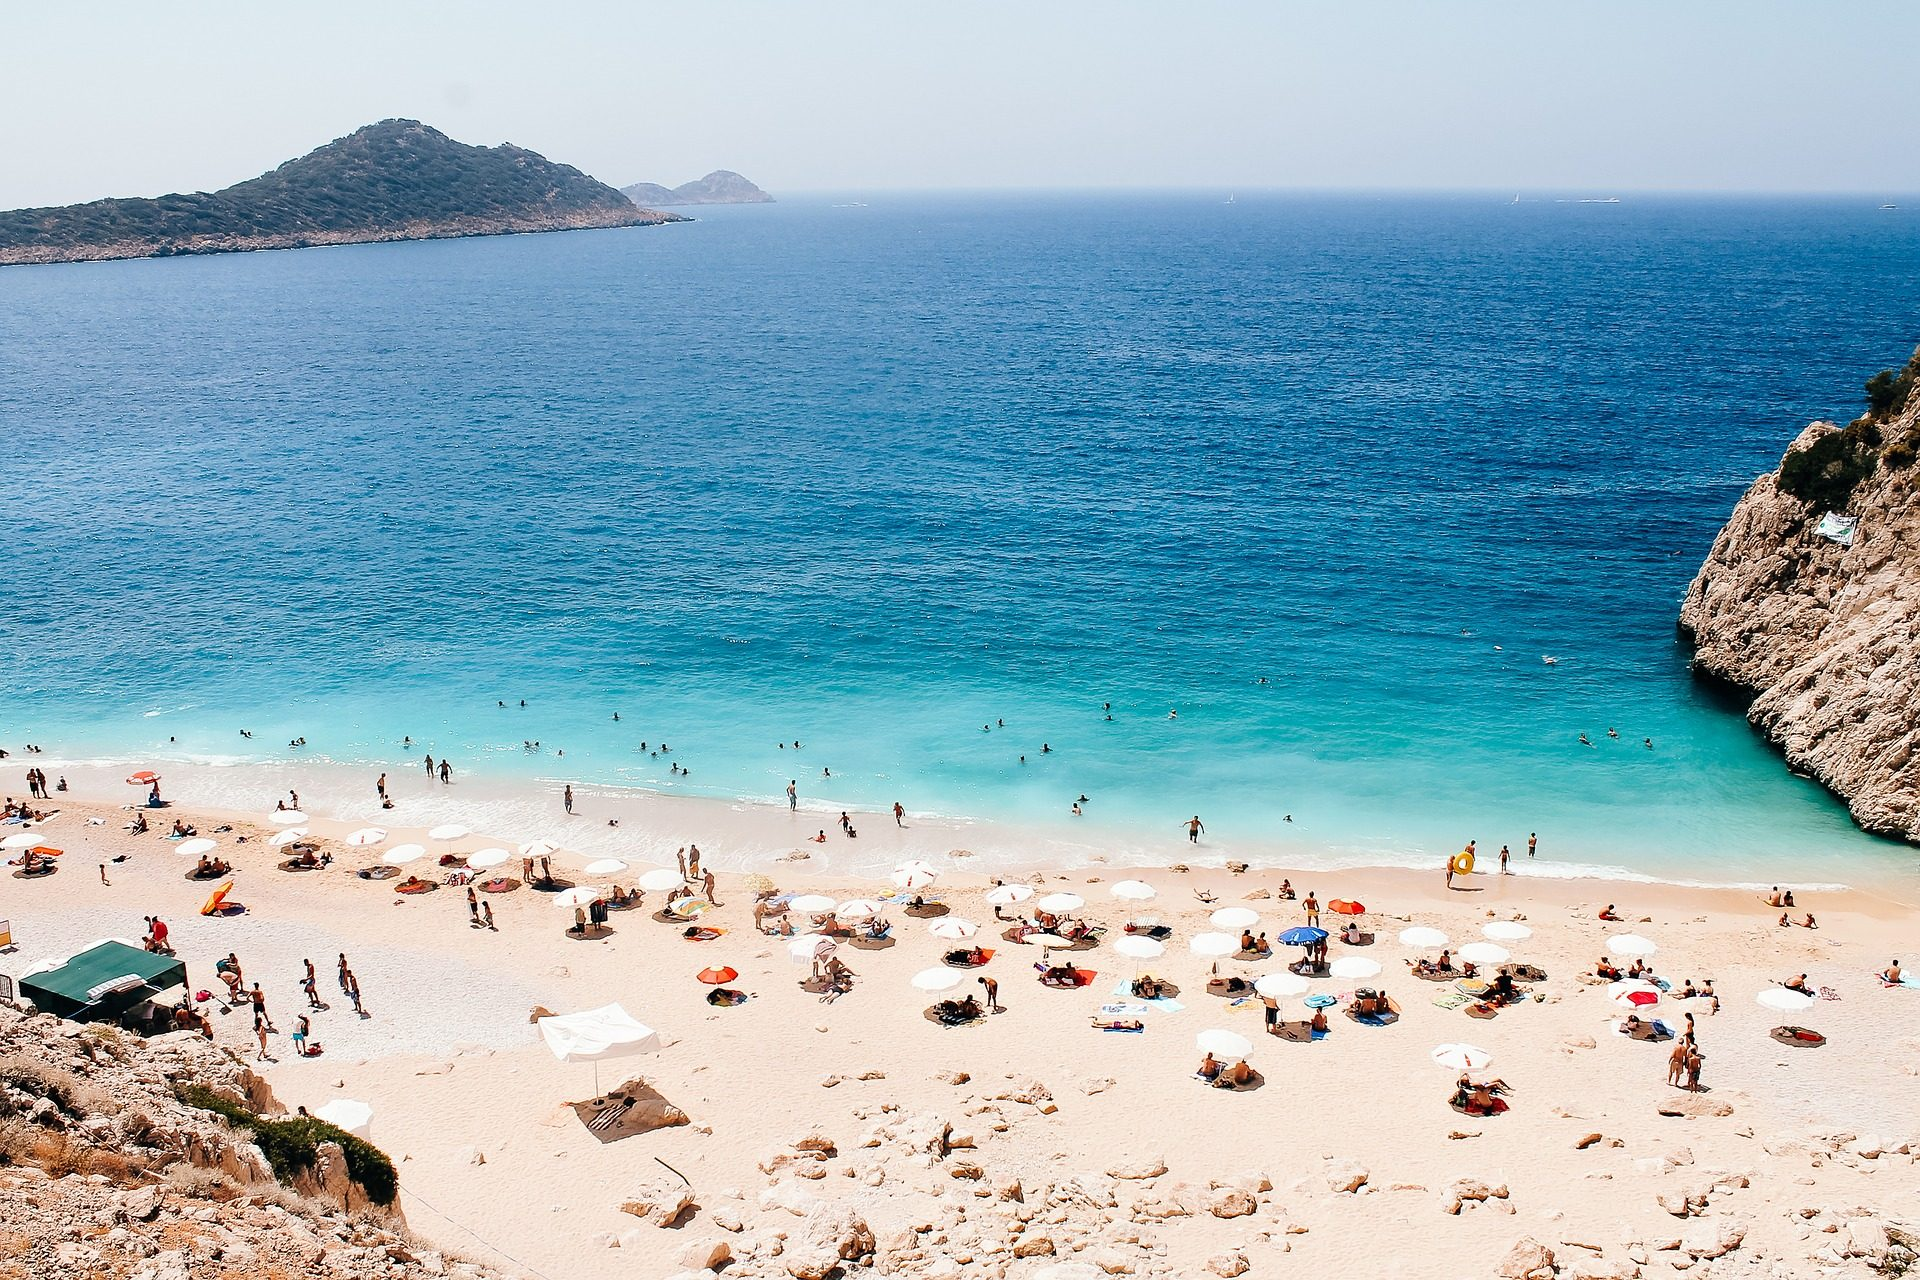 All Inklusive Urlaub in Türkei ab 196,00€ - Side Titreyengöl 4,5 Sterne